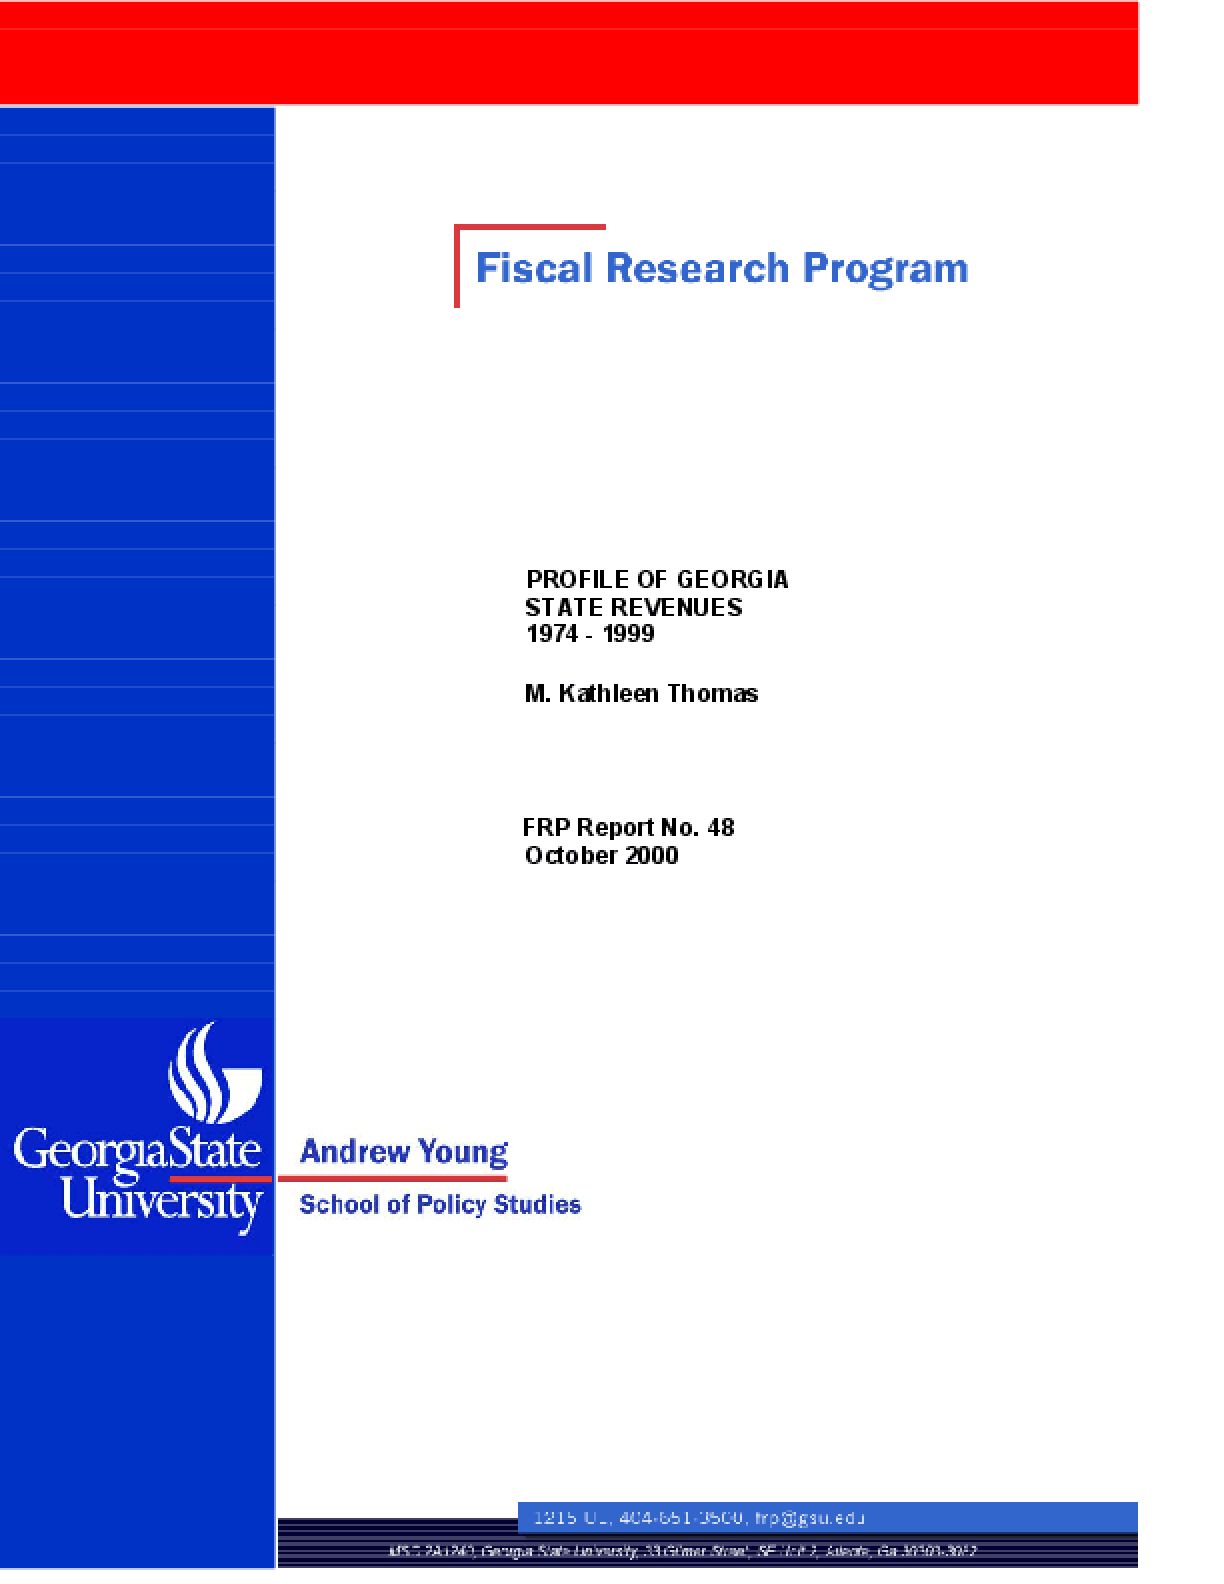 Profile of Georgia State Revenues 1974-1999